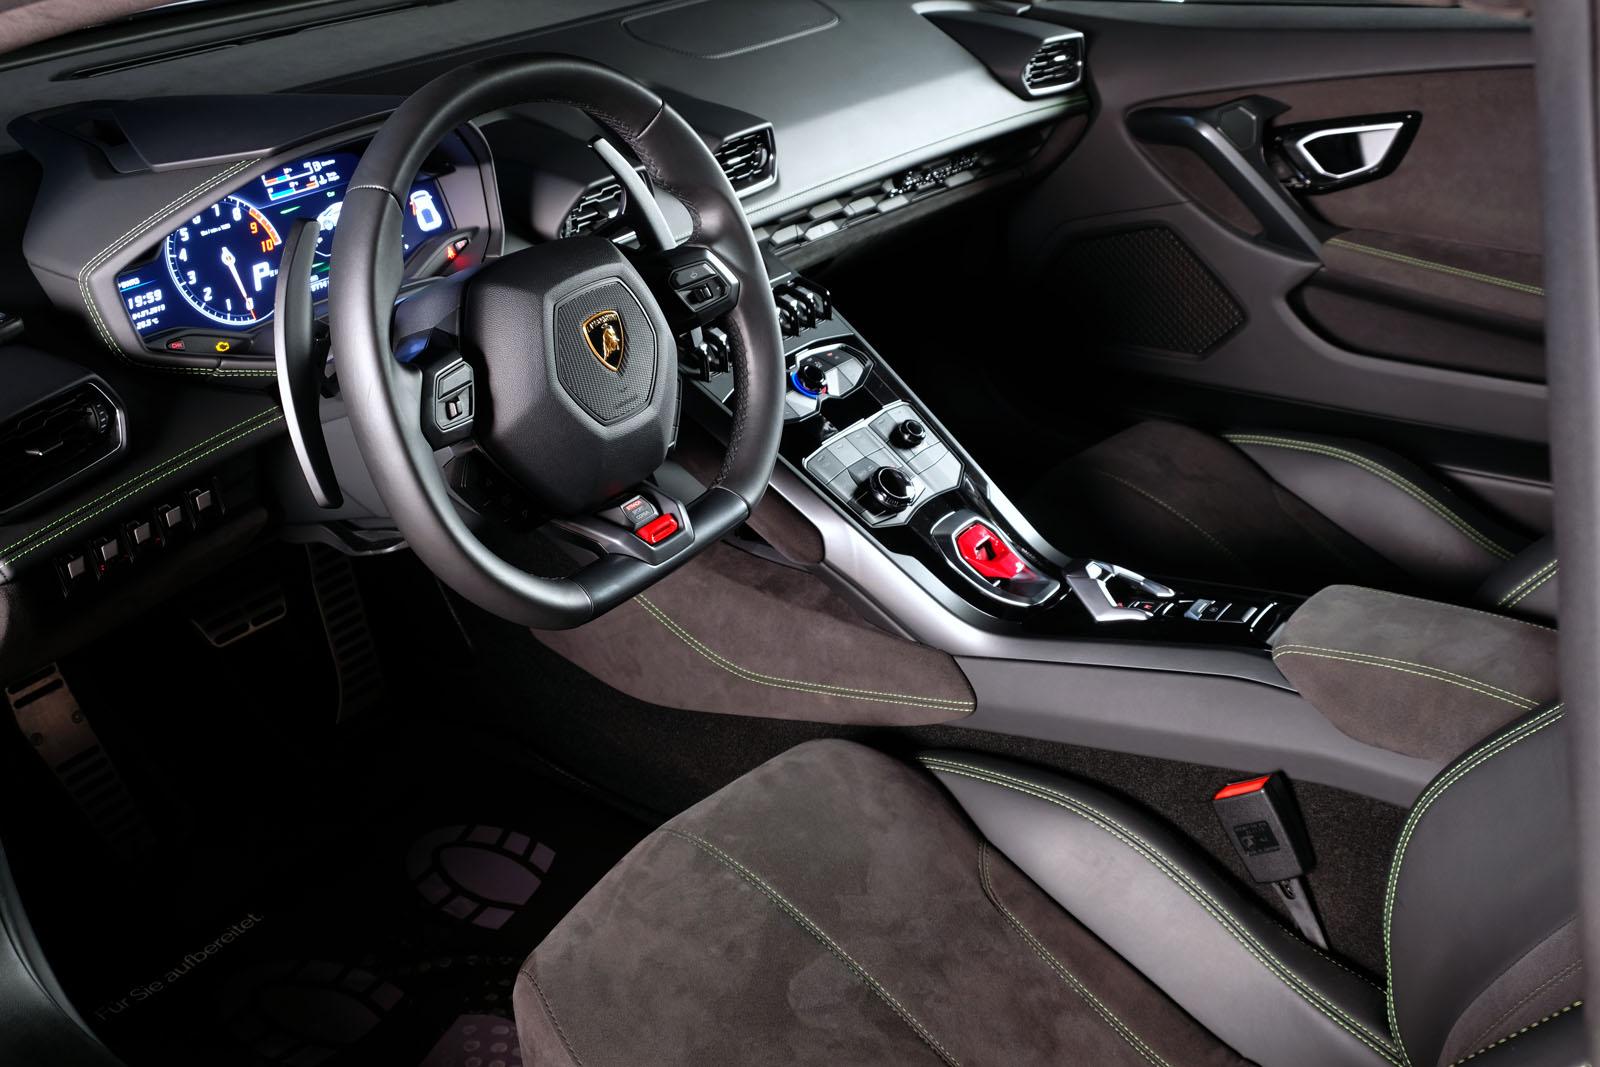 Lamborghini_Huracan_Silber_Schwarz-LAM-4265_11_w